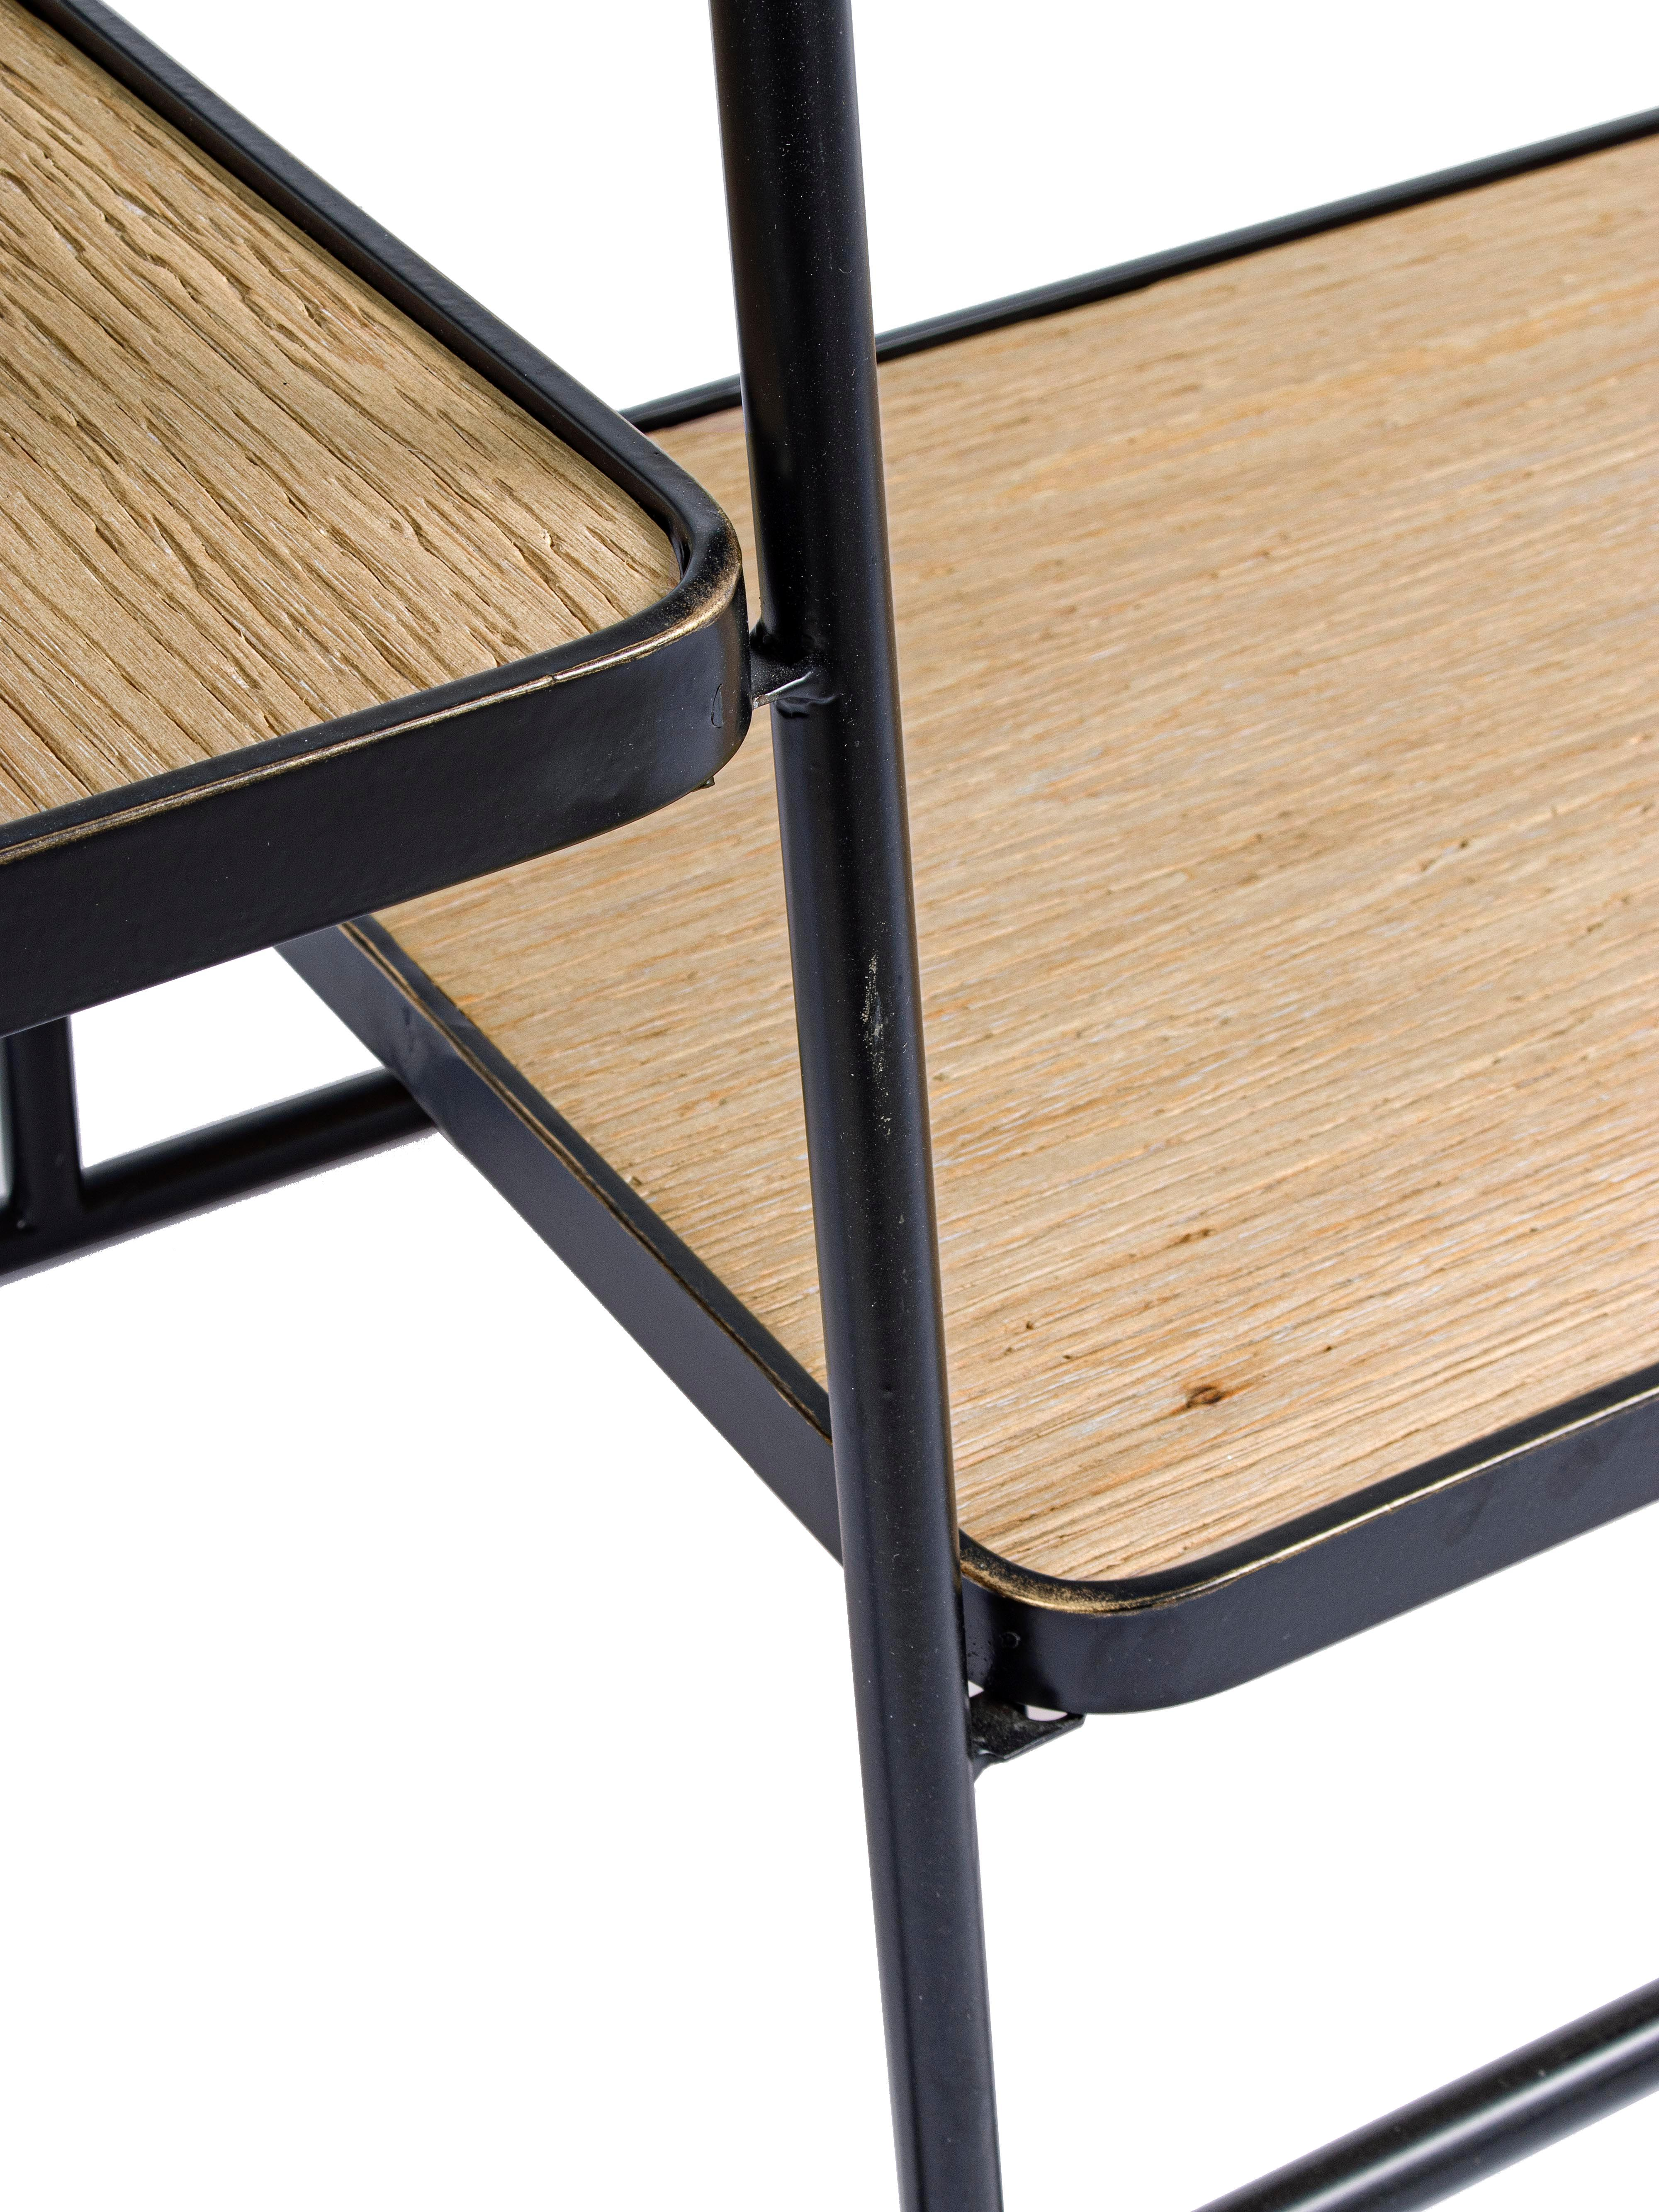 Burro con espejo Jerrod, Estructura: metal epoxidado con pintu, Estantes: tablero de fibras de dens, Espejo: cristal, Negro, marrón, An 93 x Al 178 cm